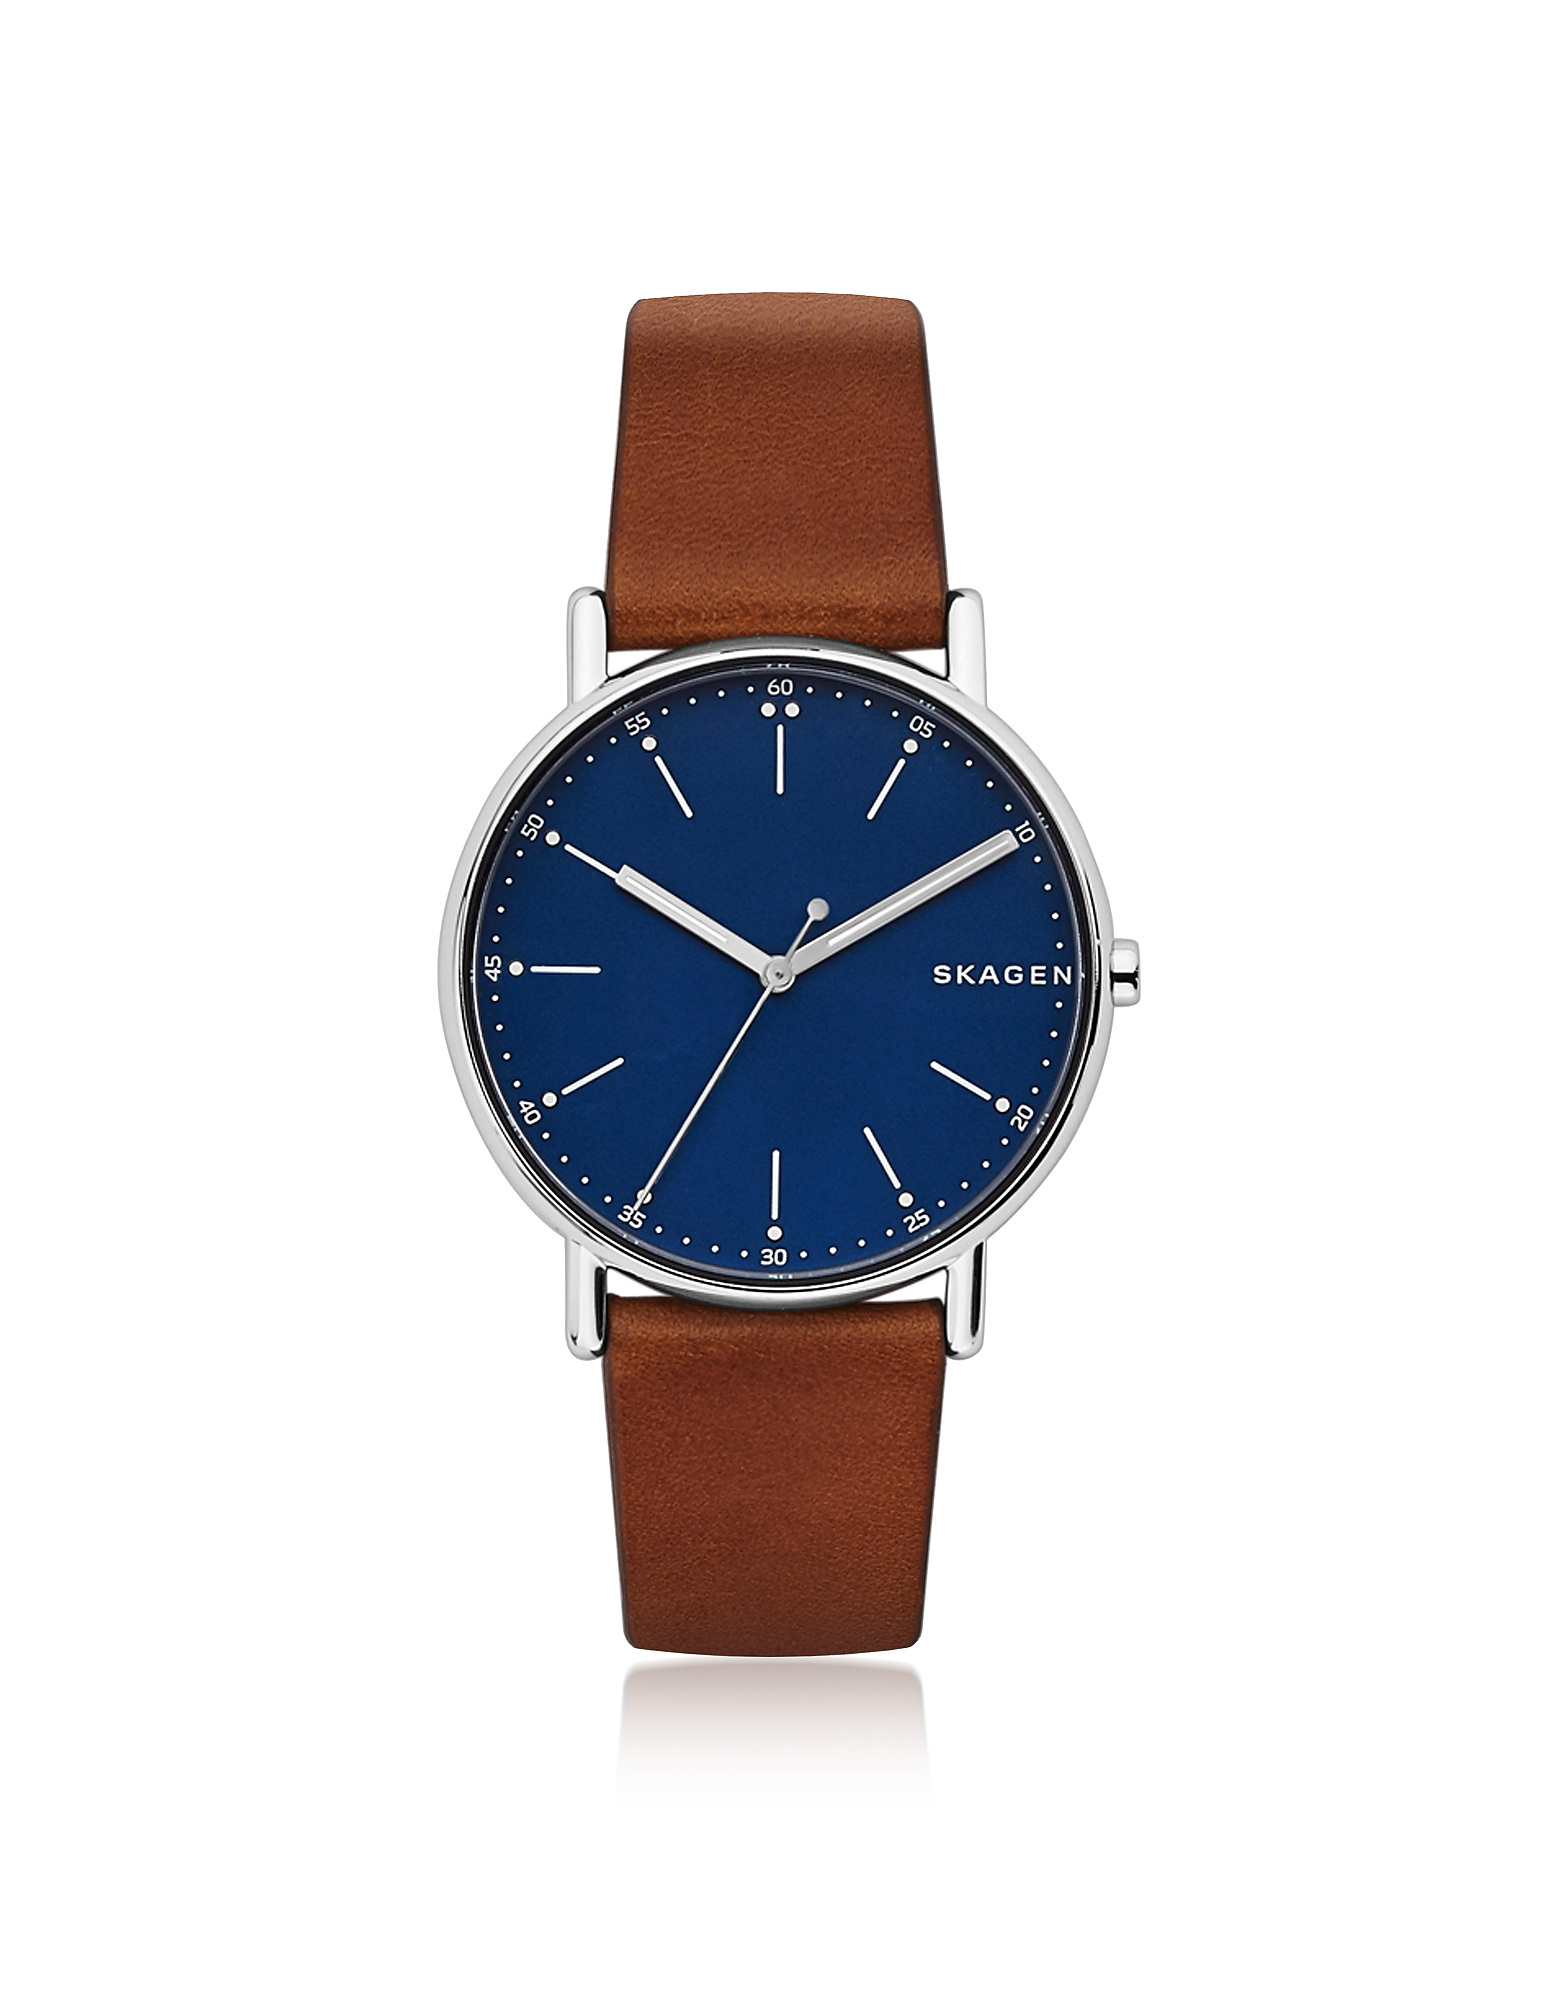 Skagen Men's Watches, Signatur Brown Leather Men's Watch